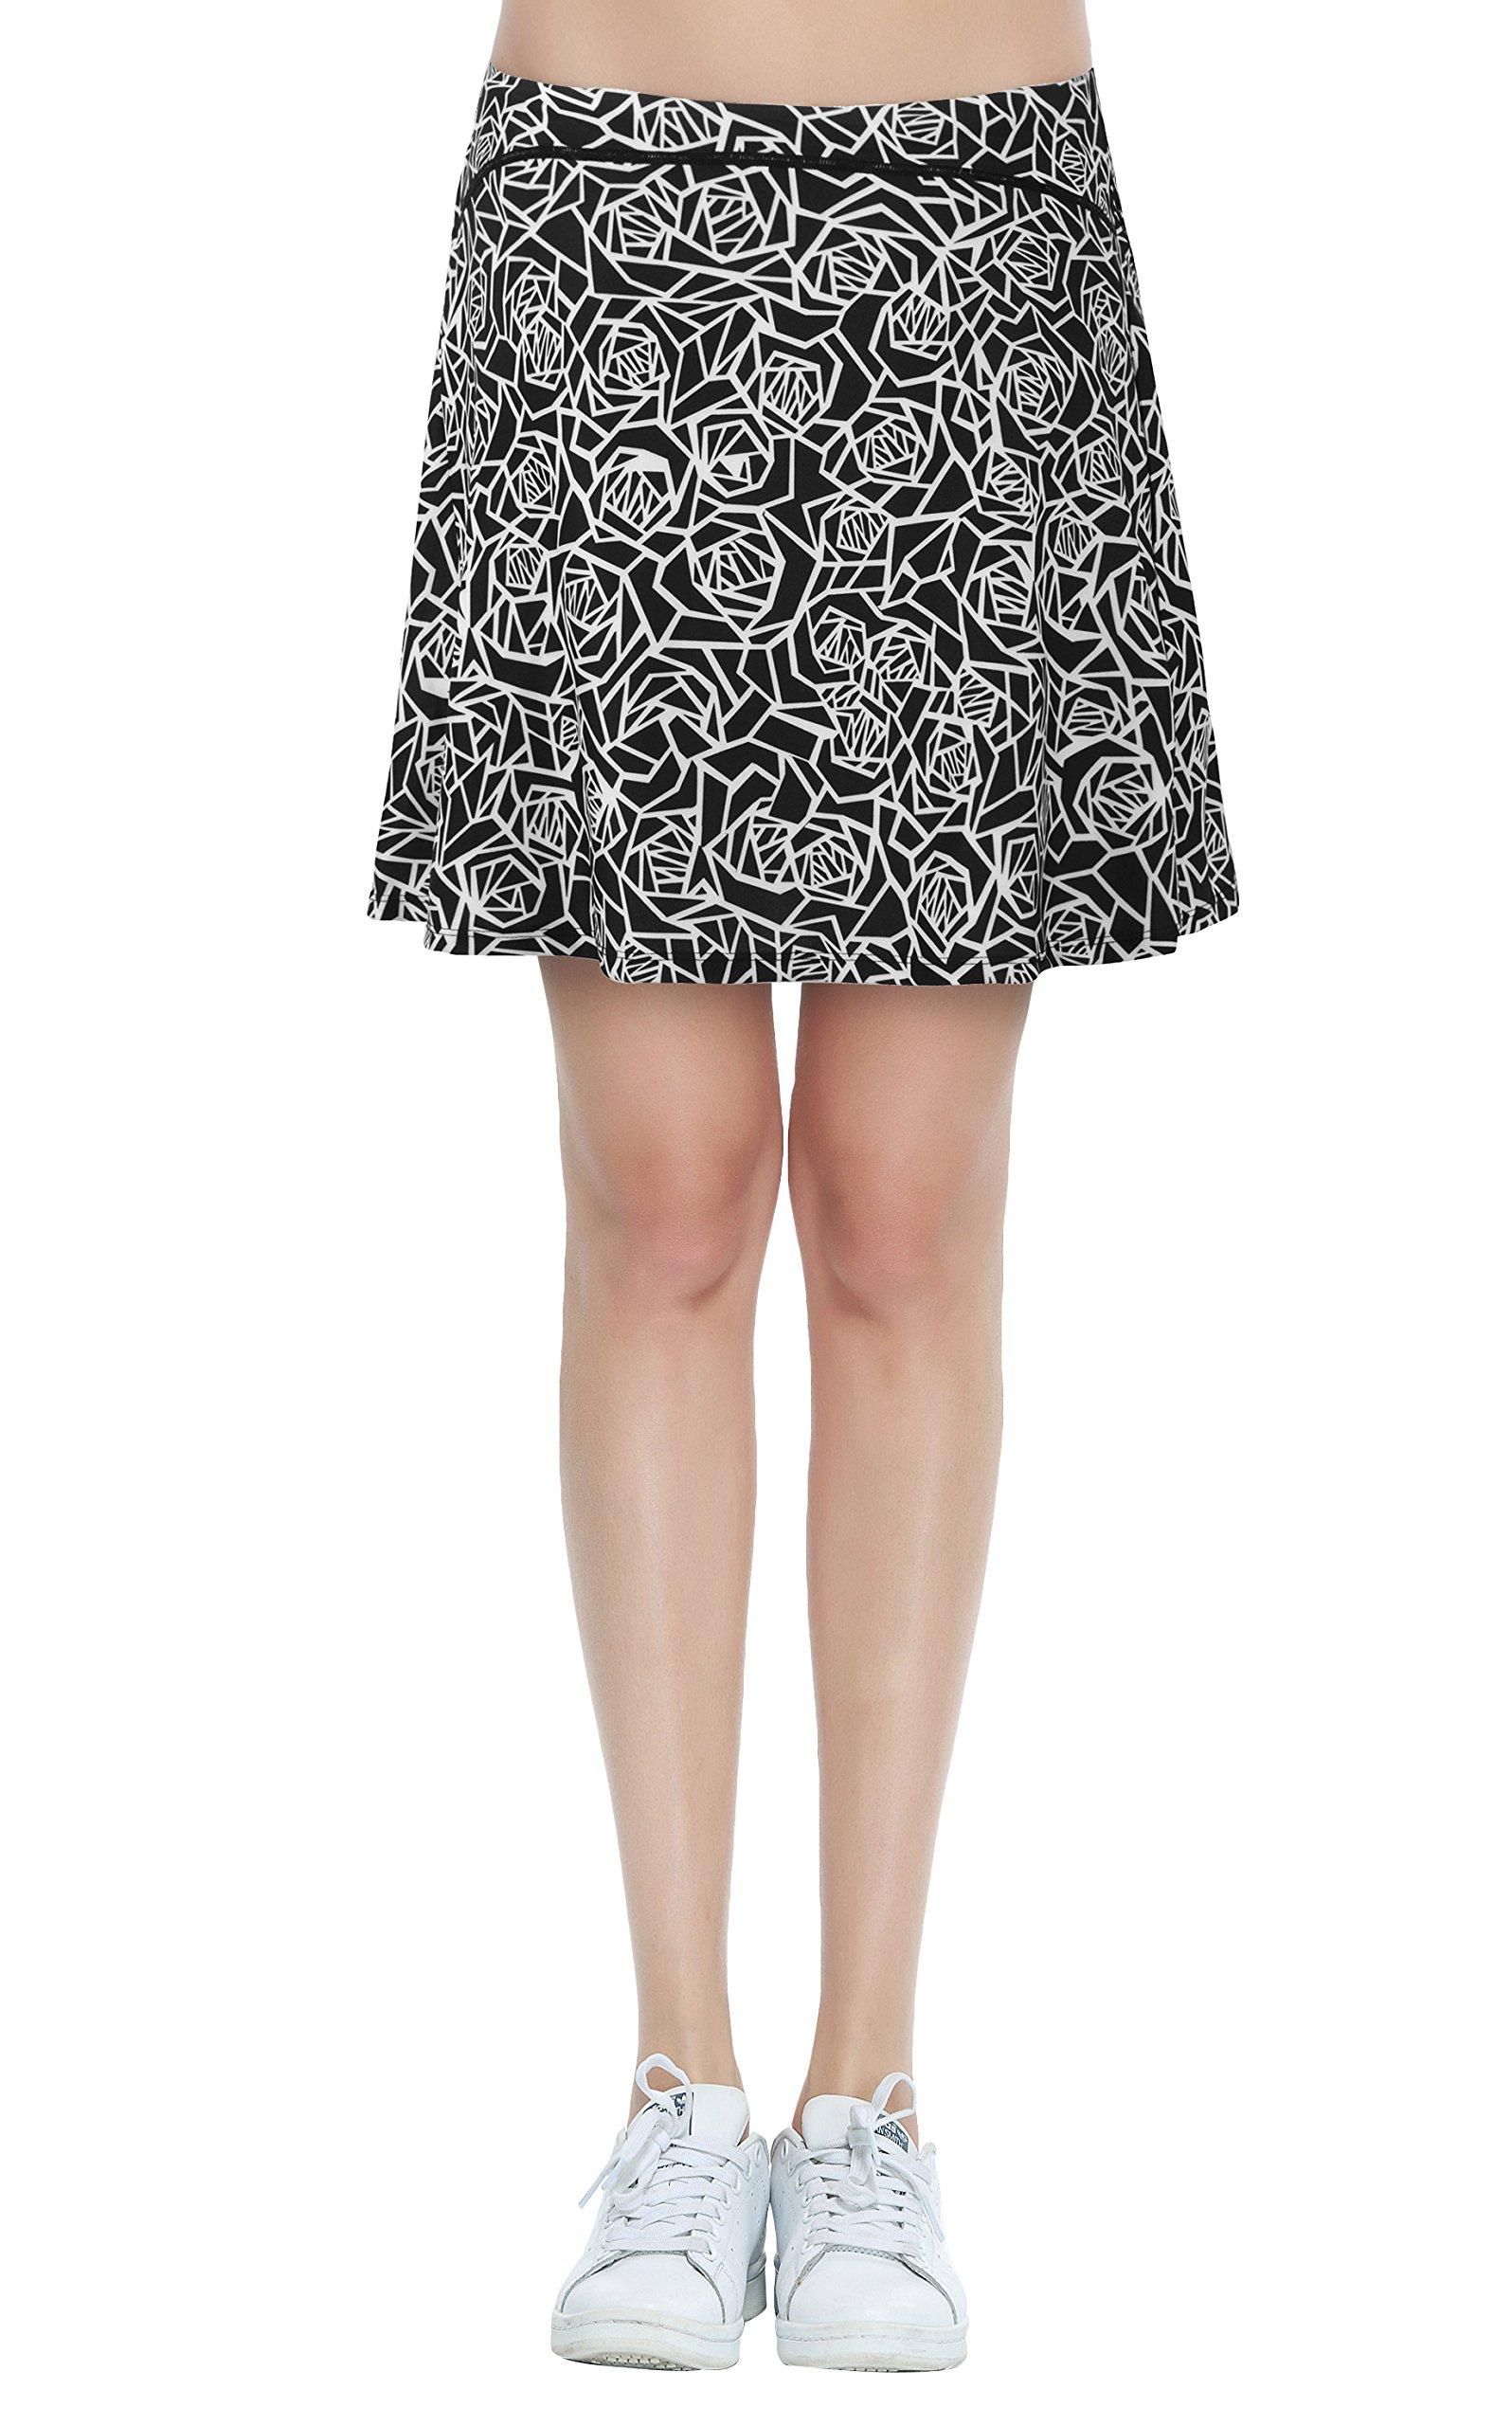 Women's Knee Length Workout Skirt Side Slit Sports Golf Skorts with Pockets(Flower Print,S)